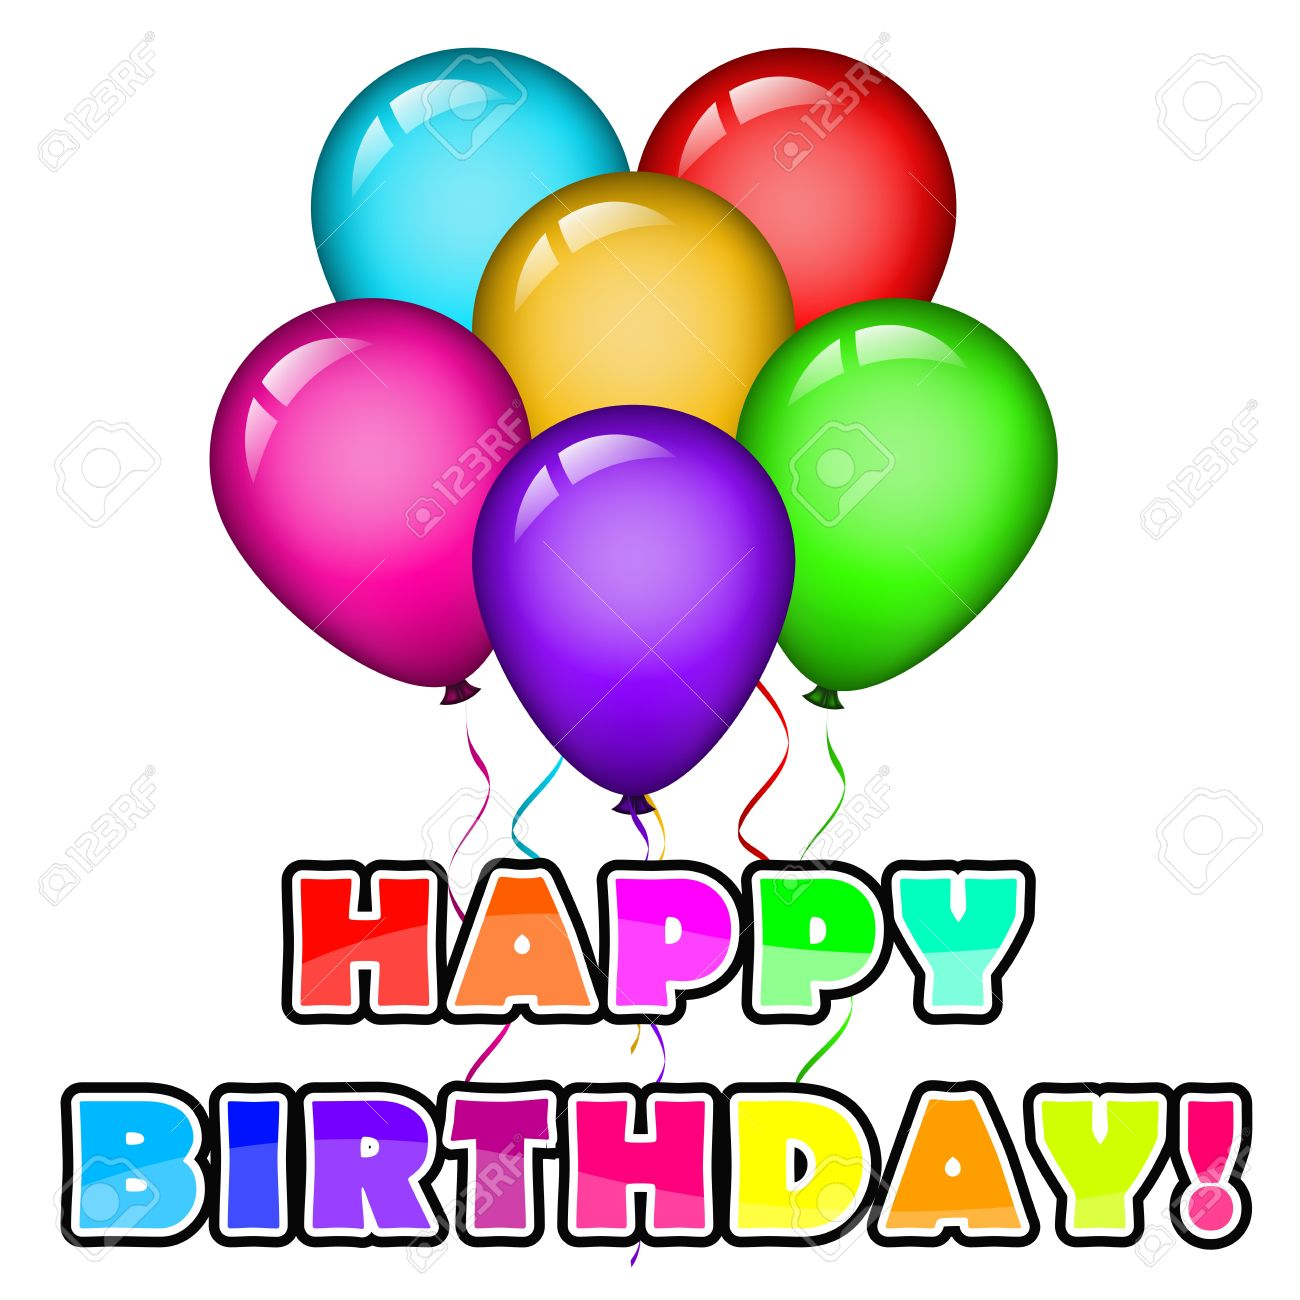 Happy birthday background with nallons Stock Vector - 13443345